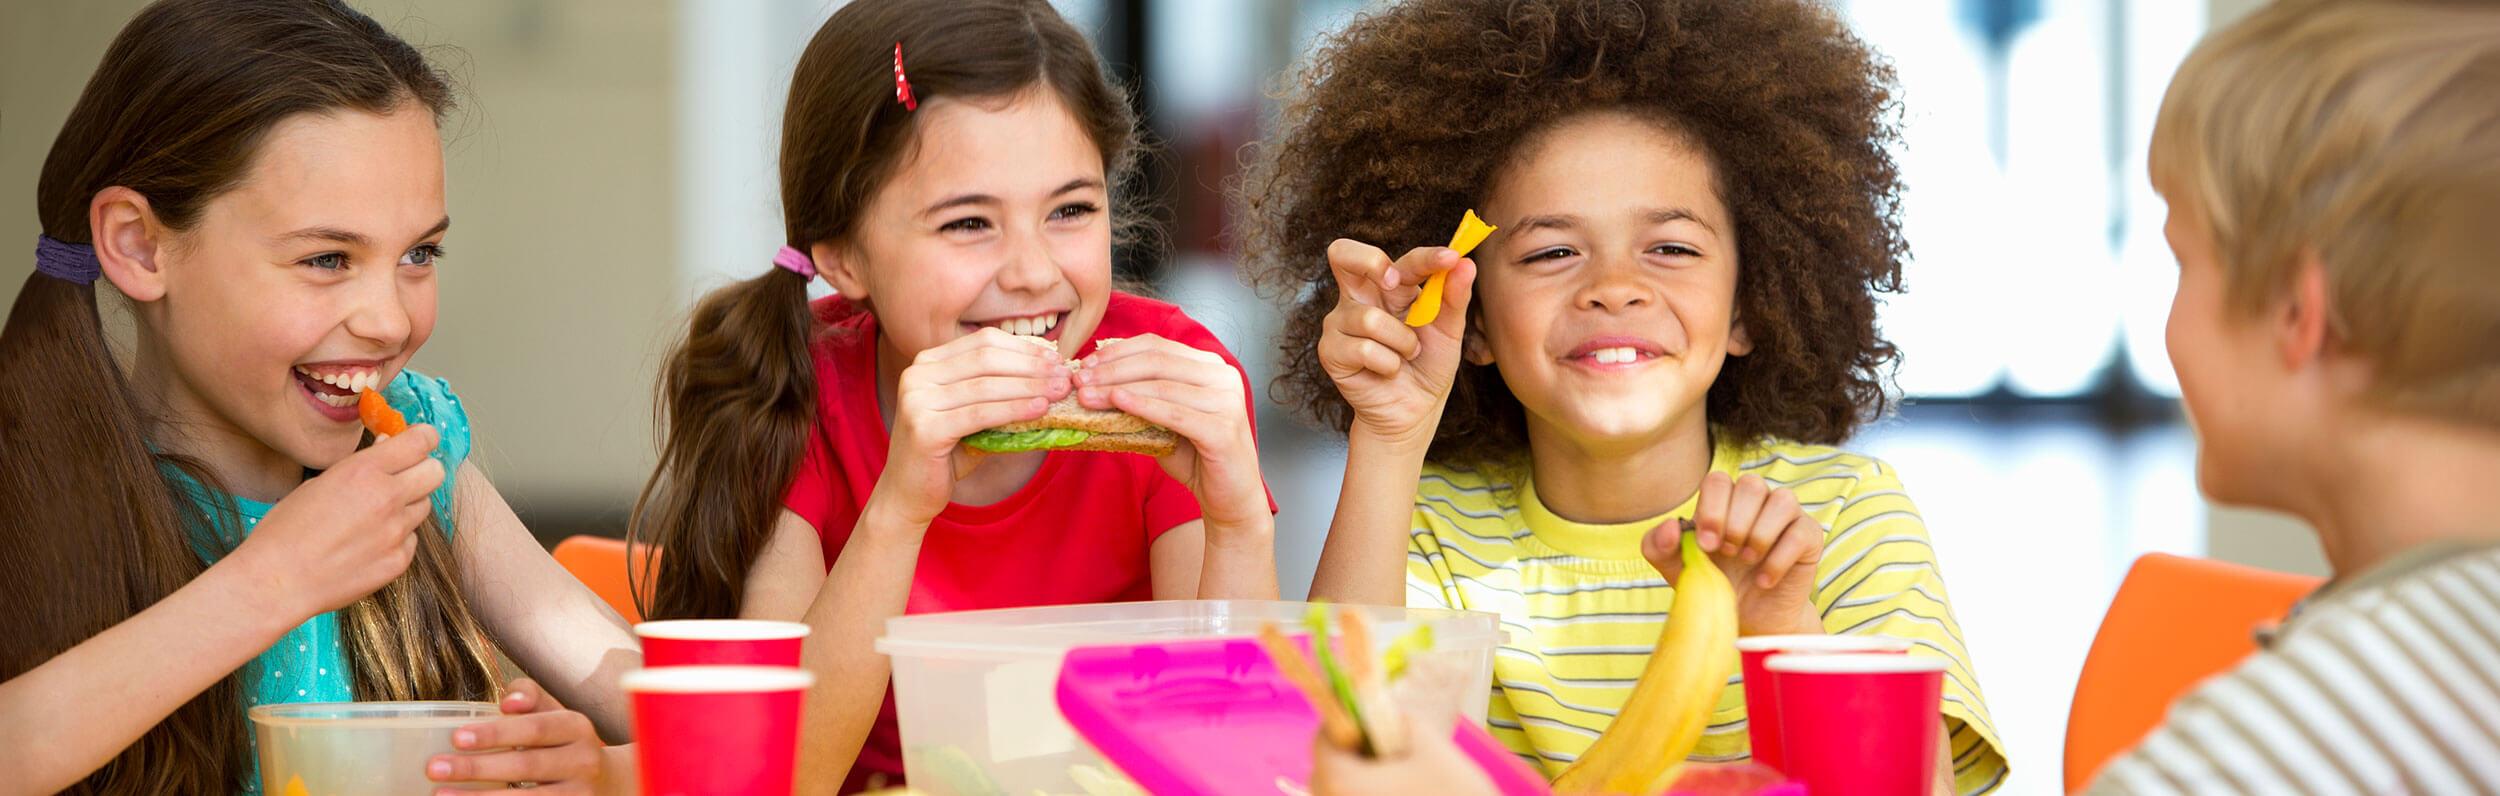 daycare meal plan - children eating together at a table - Novick Childcare